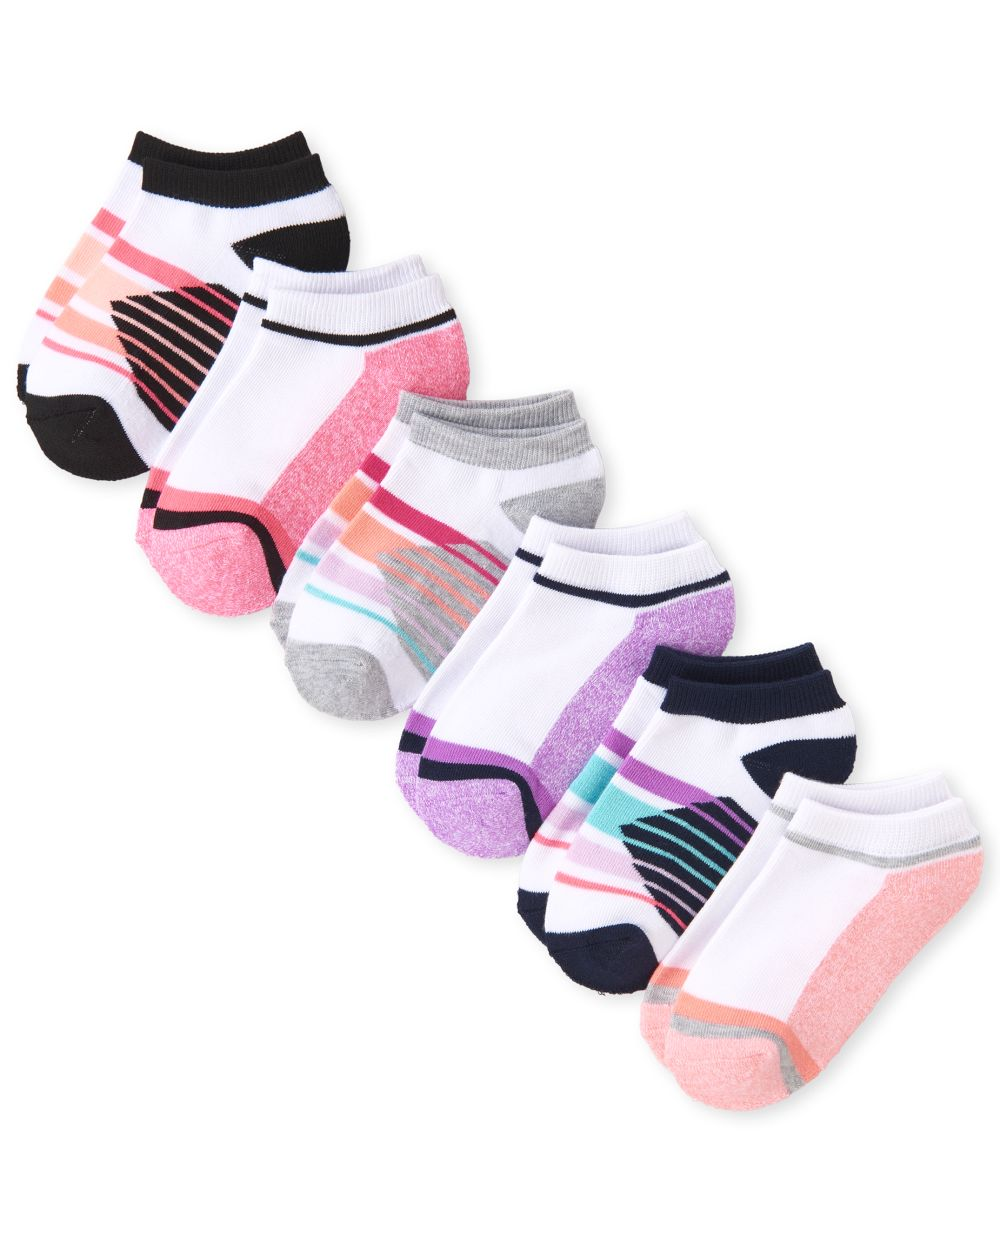 Girls Striped Athletic Ankle Socks 6-Pack